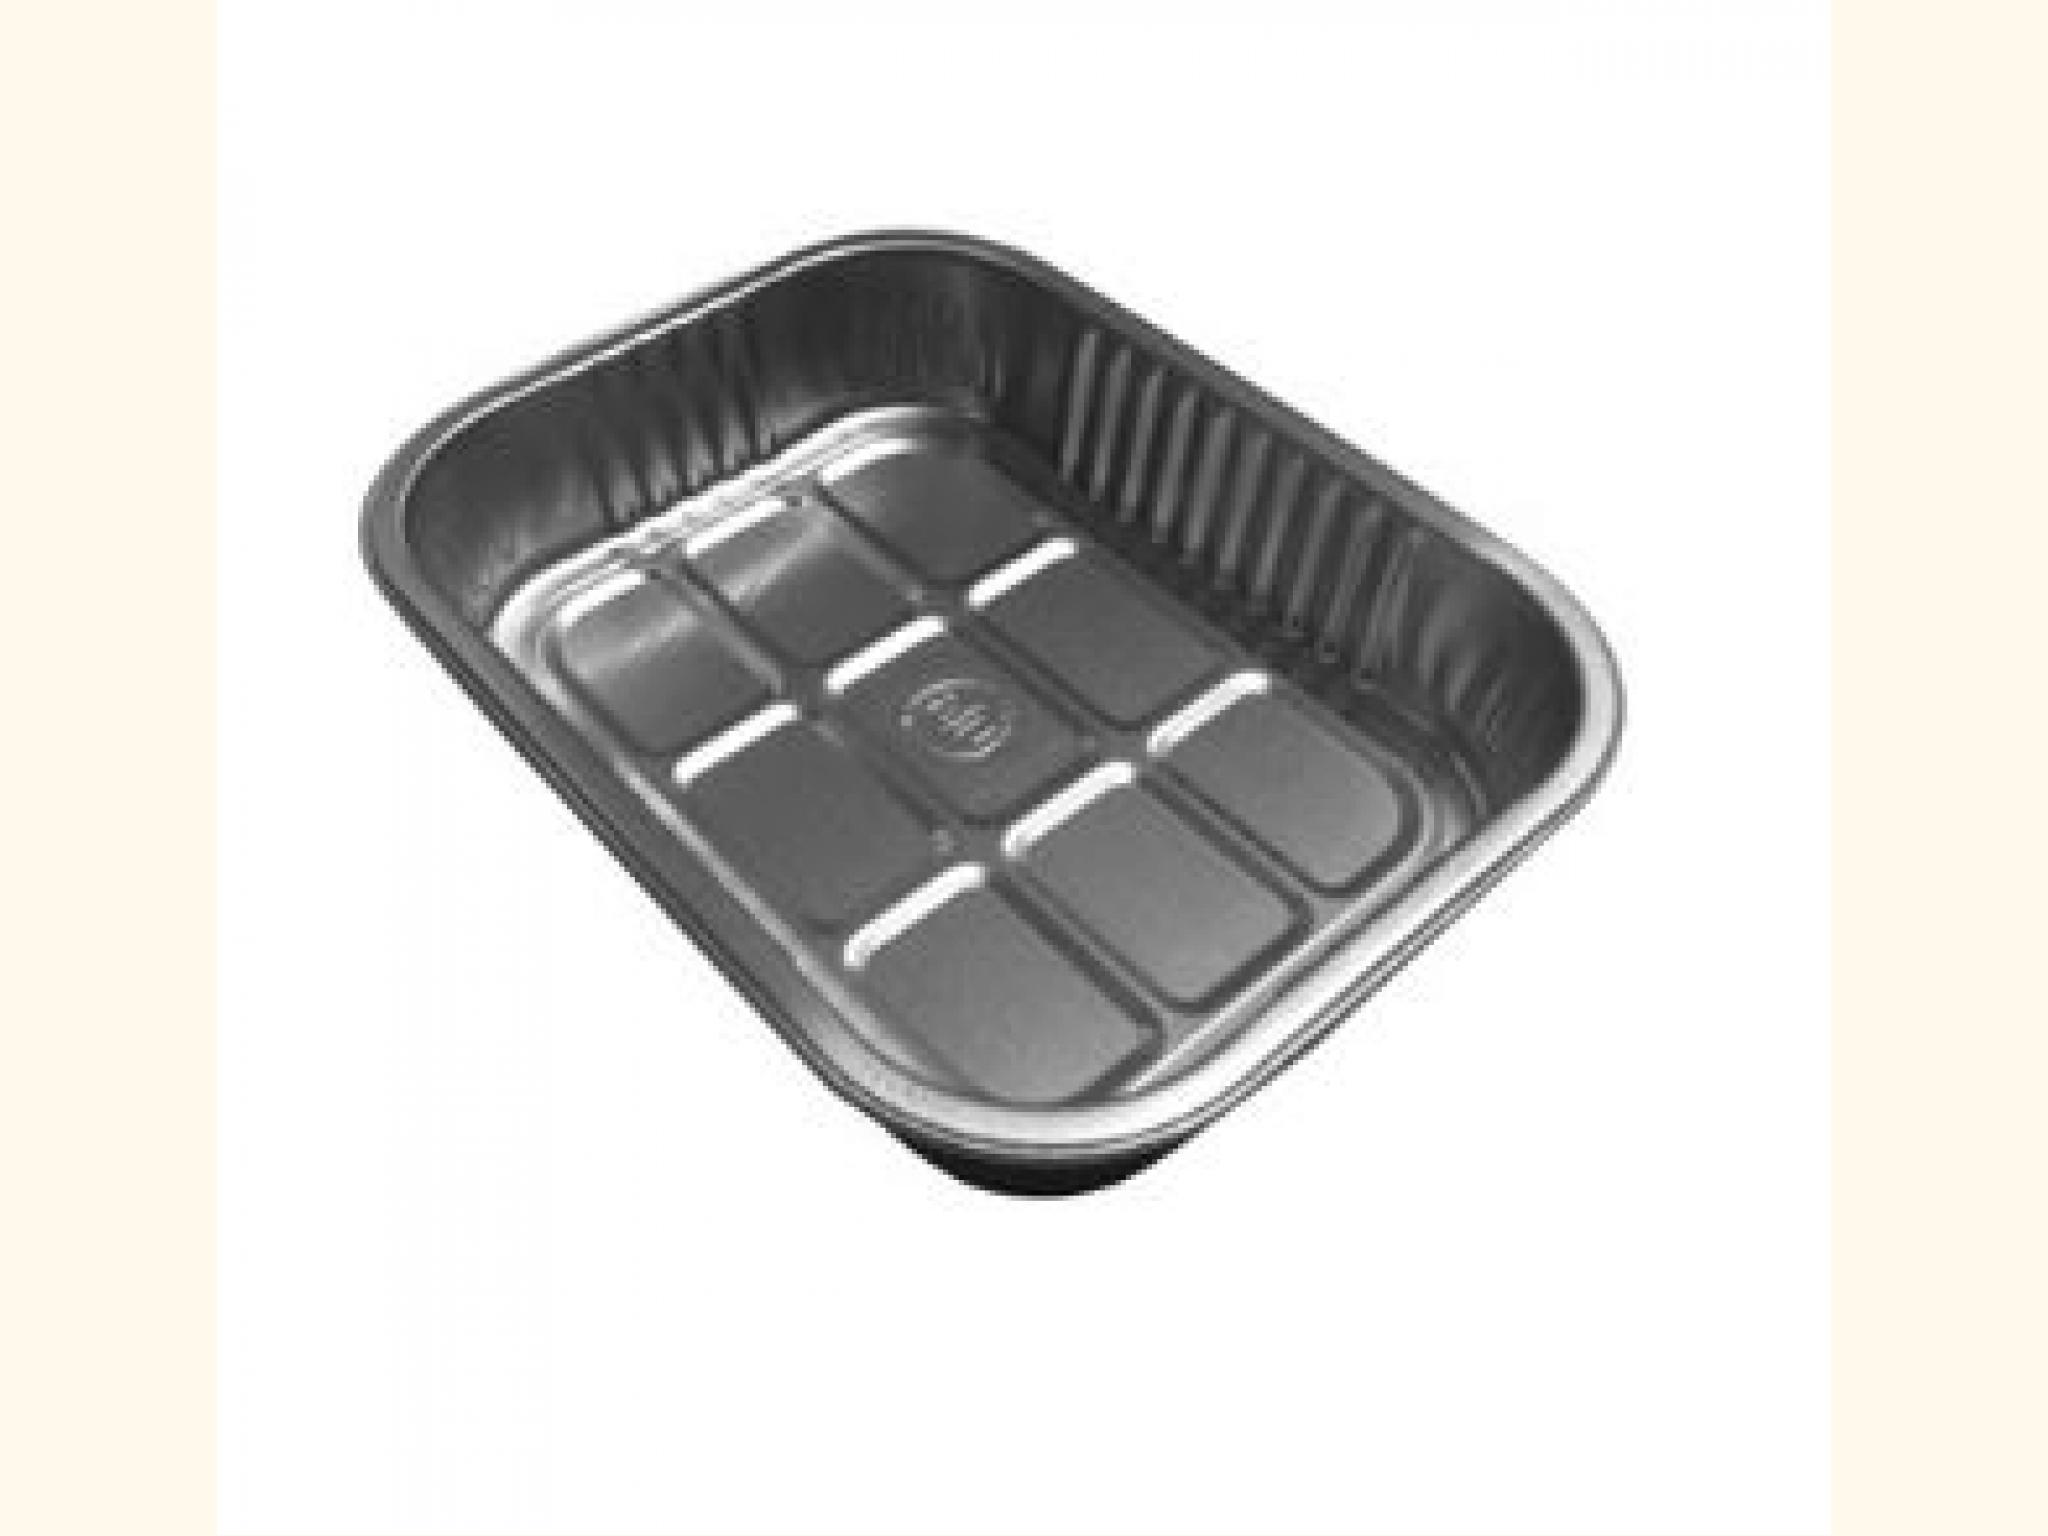 Microwaveable Aluminium Trays (178mm x 136mm) - 10 pack